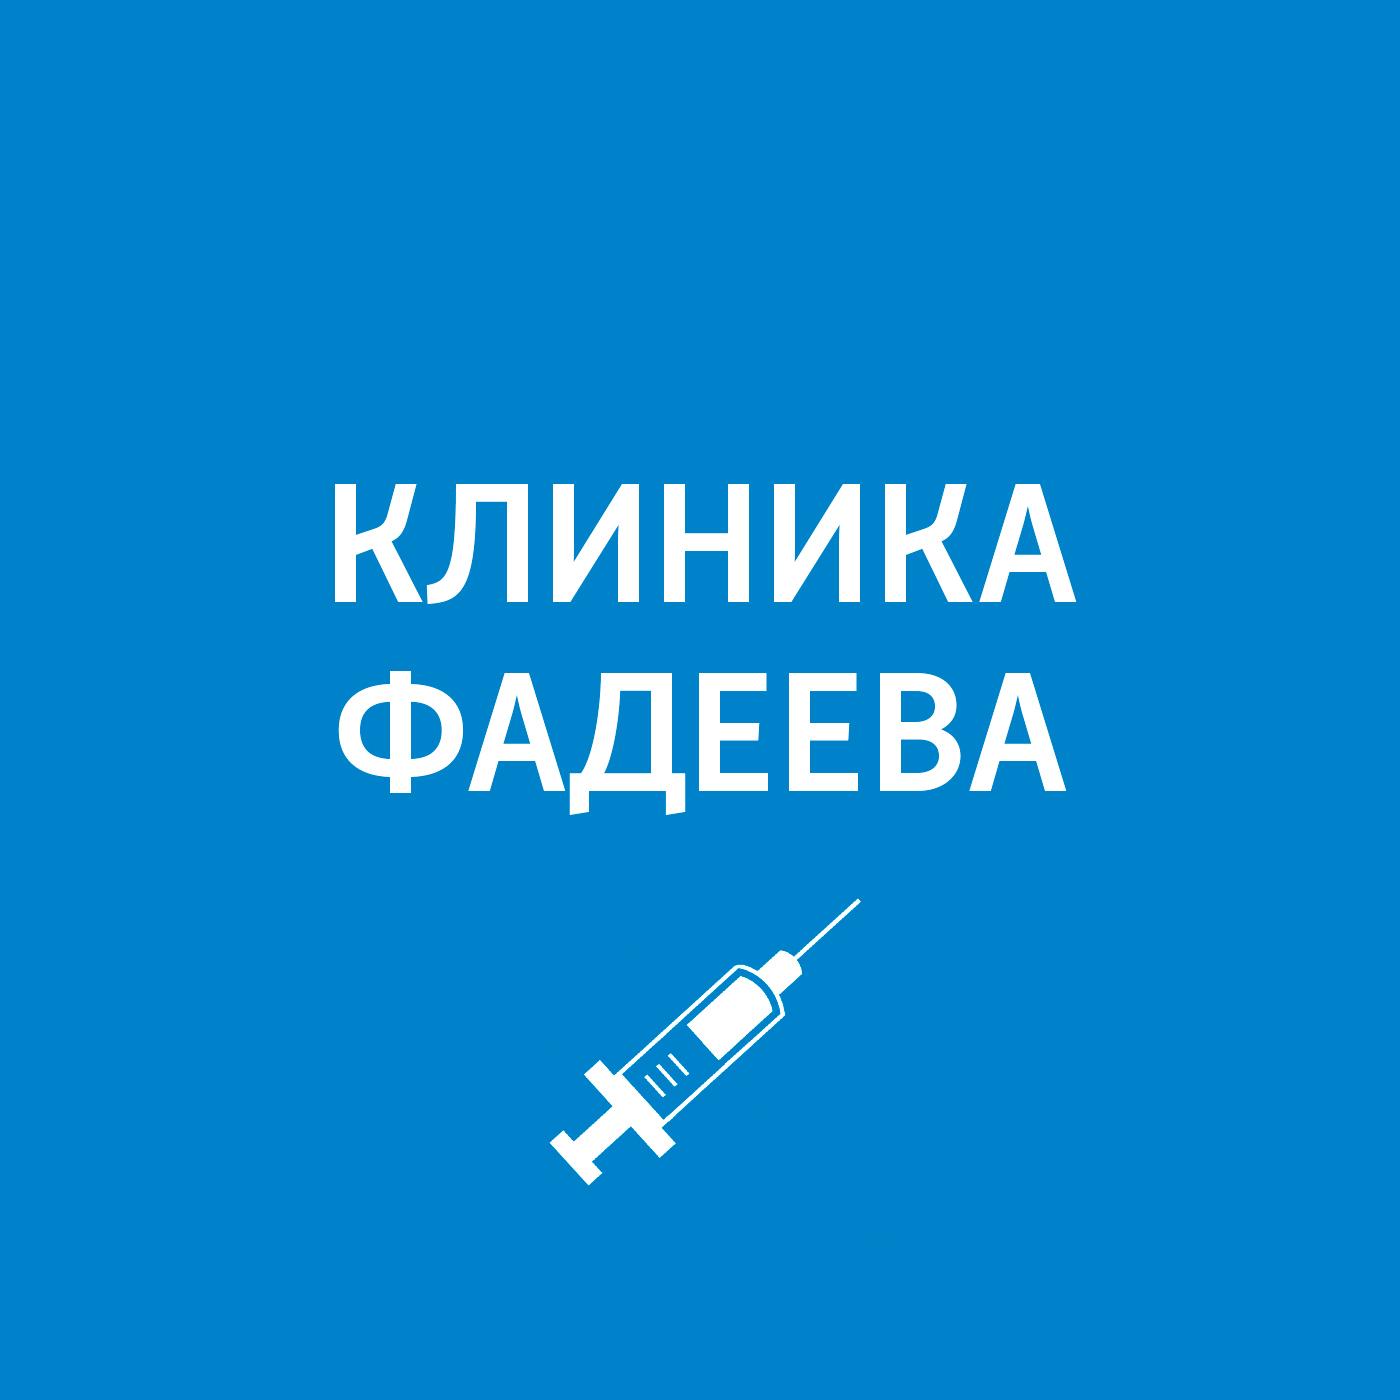 Пётр Фадеев Ветеринар-герпетолог цена 2017